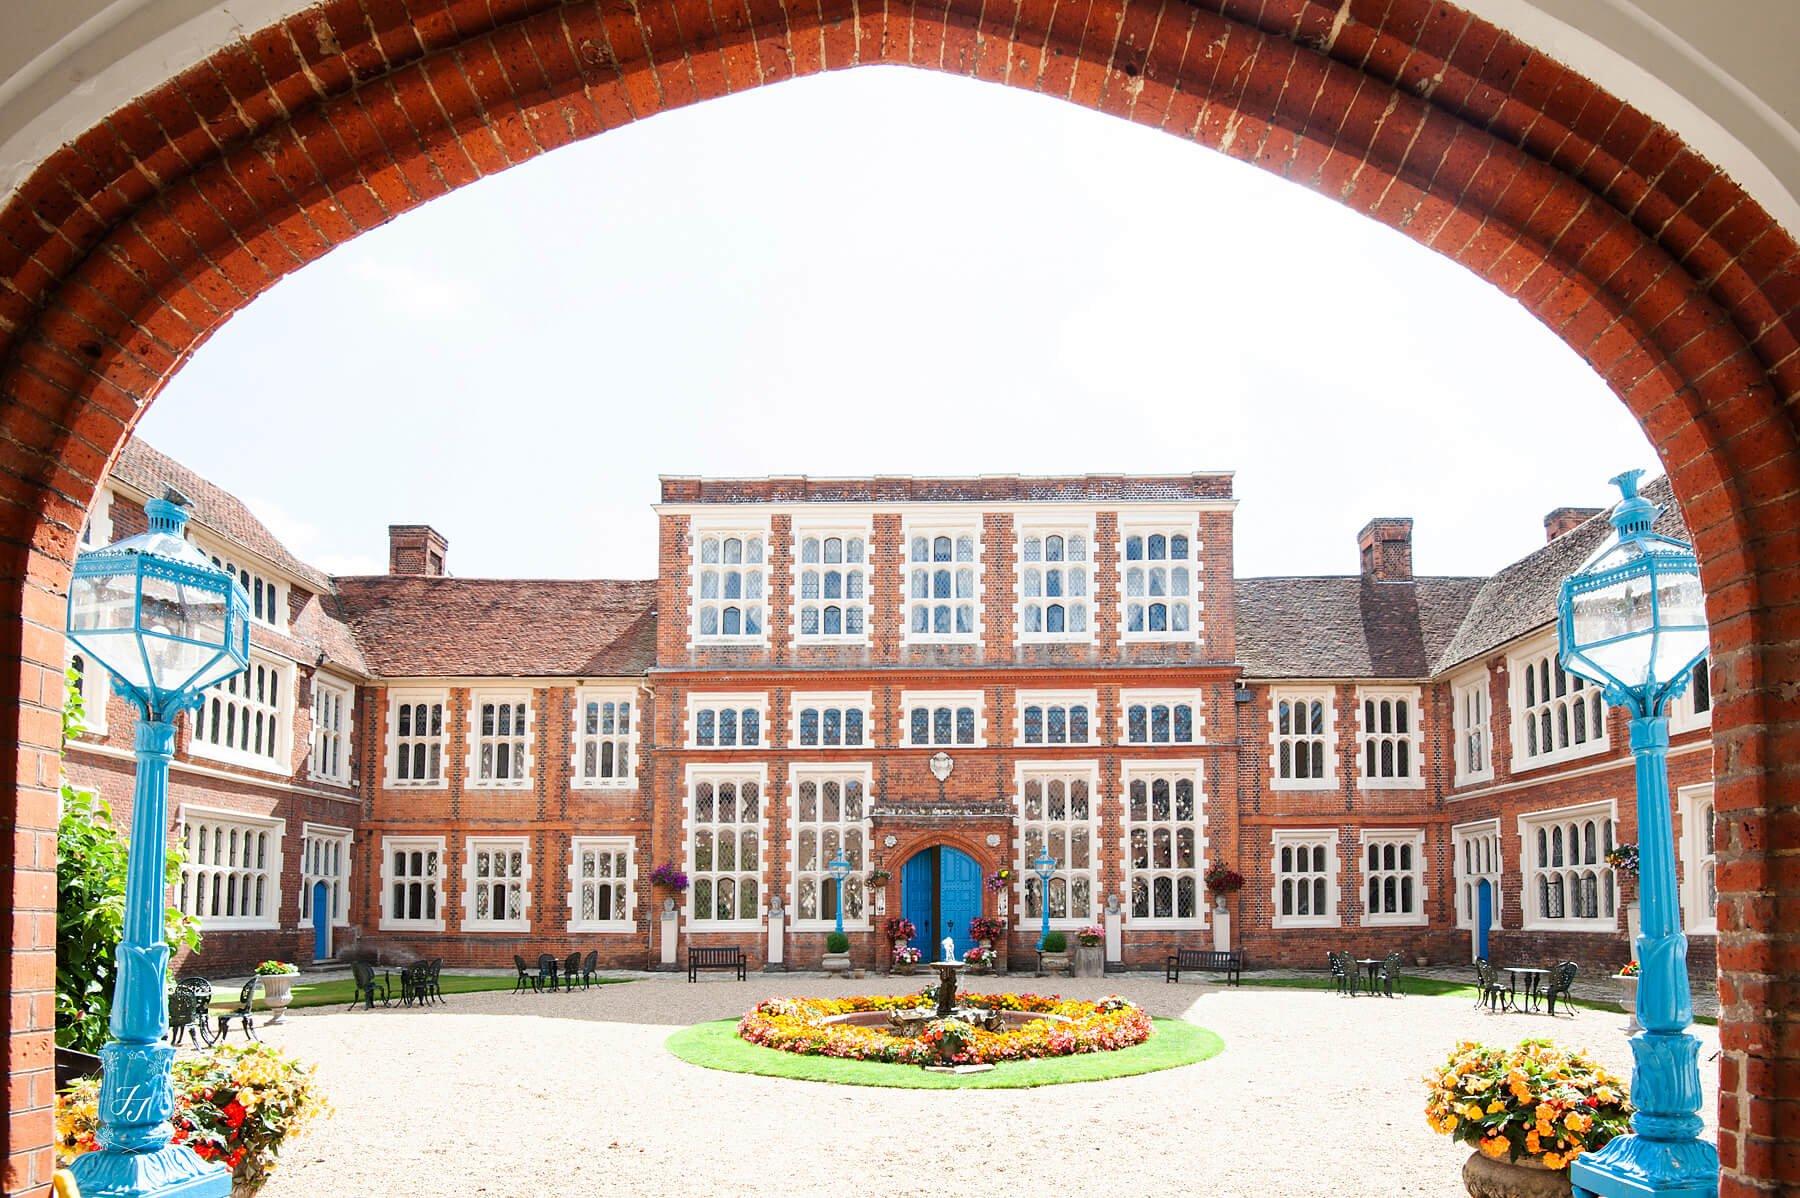 gosfield-hall-courtyard